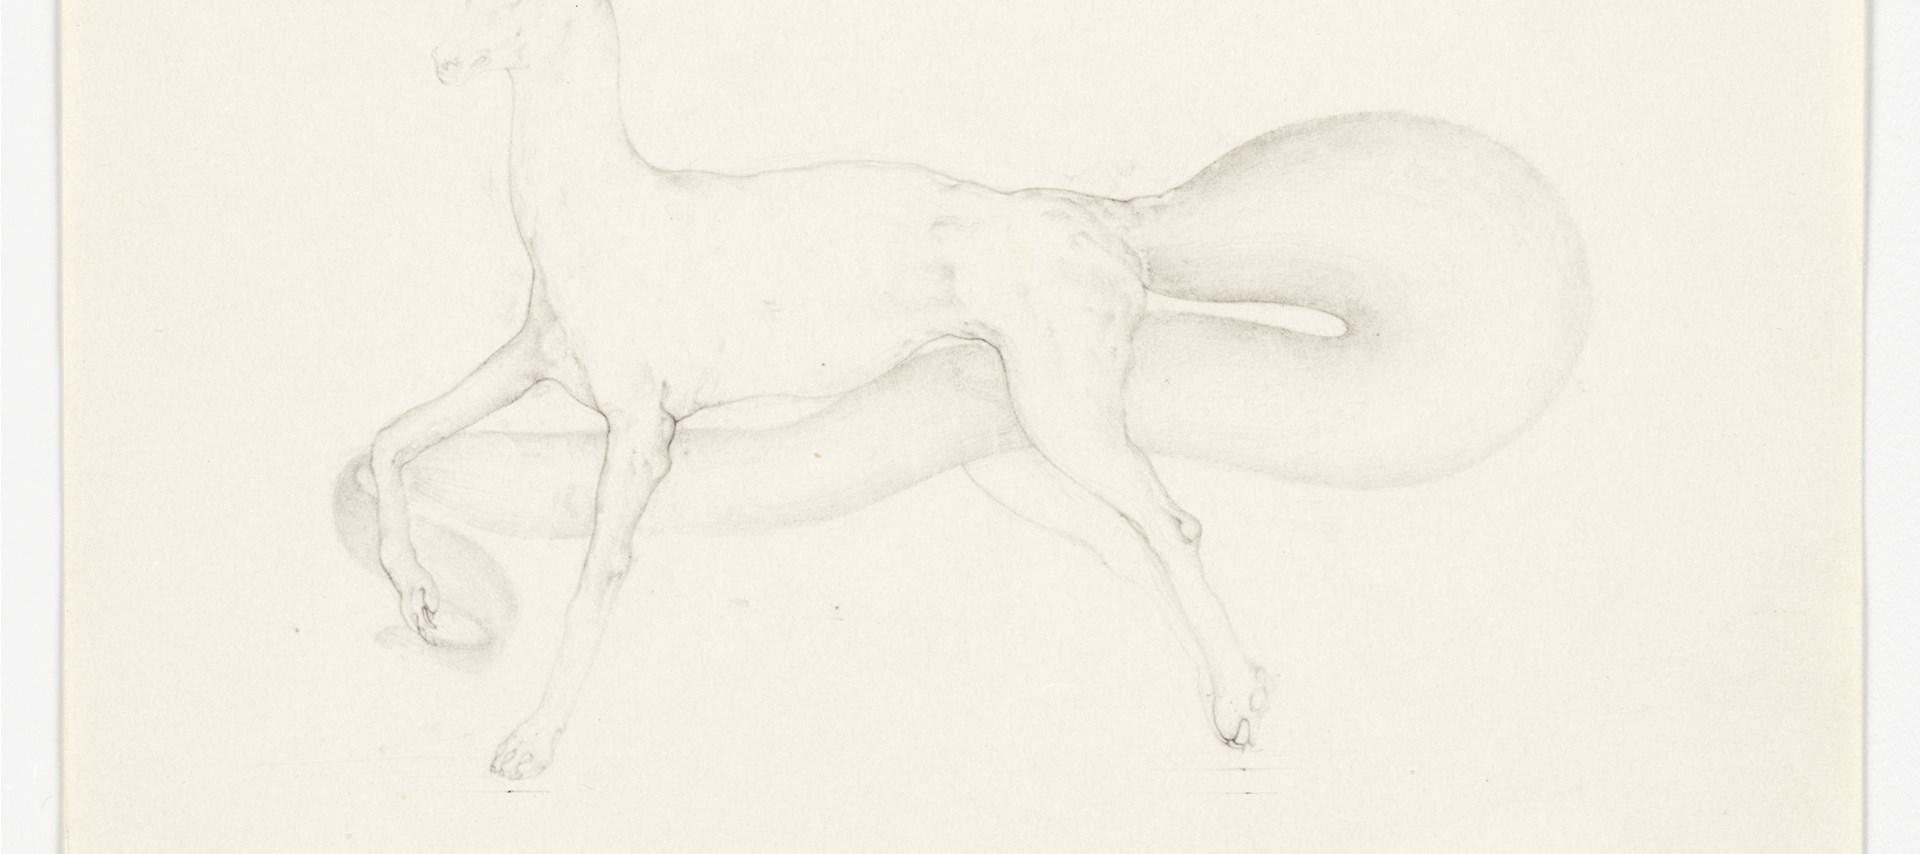 Christiana Soulou: Un animal reve par Kafka, 2013. © the artist, courtesy Sadie Coles HQ